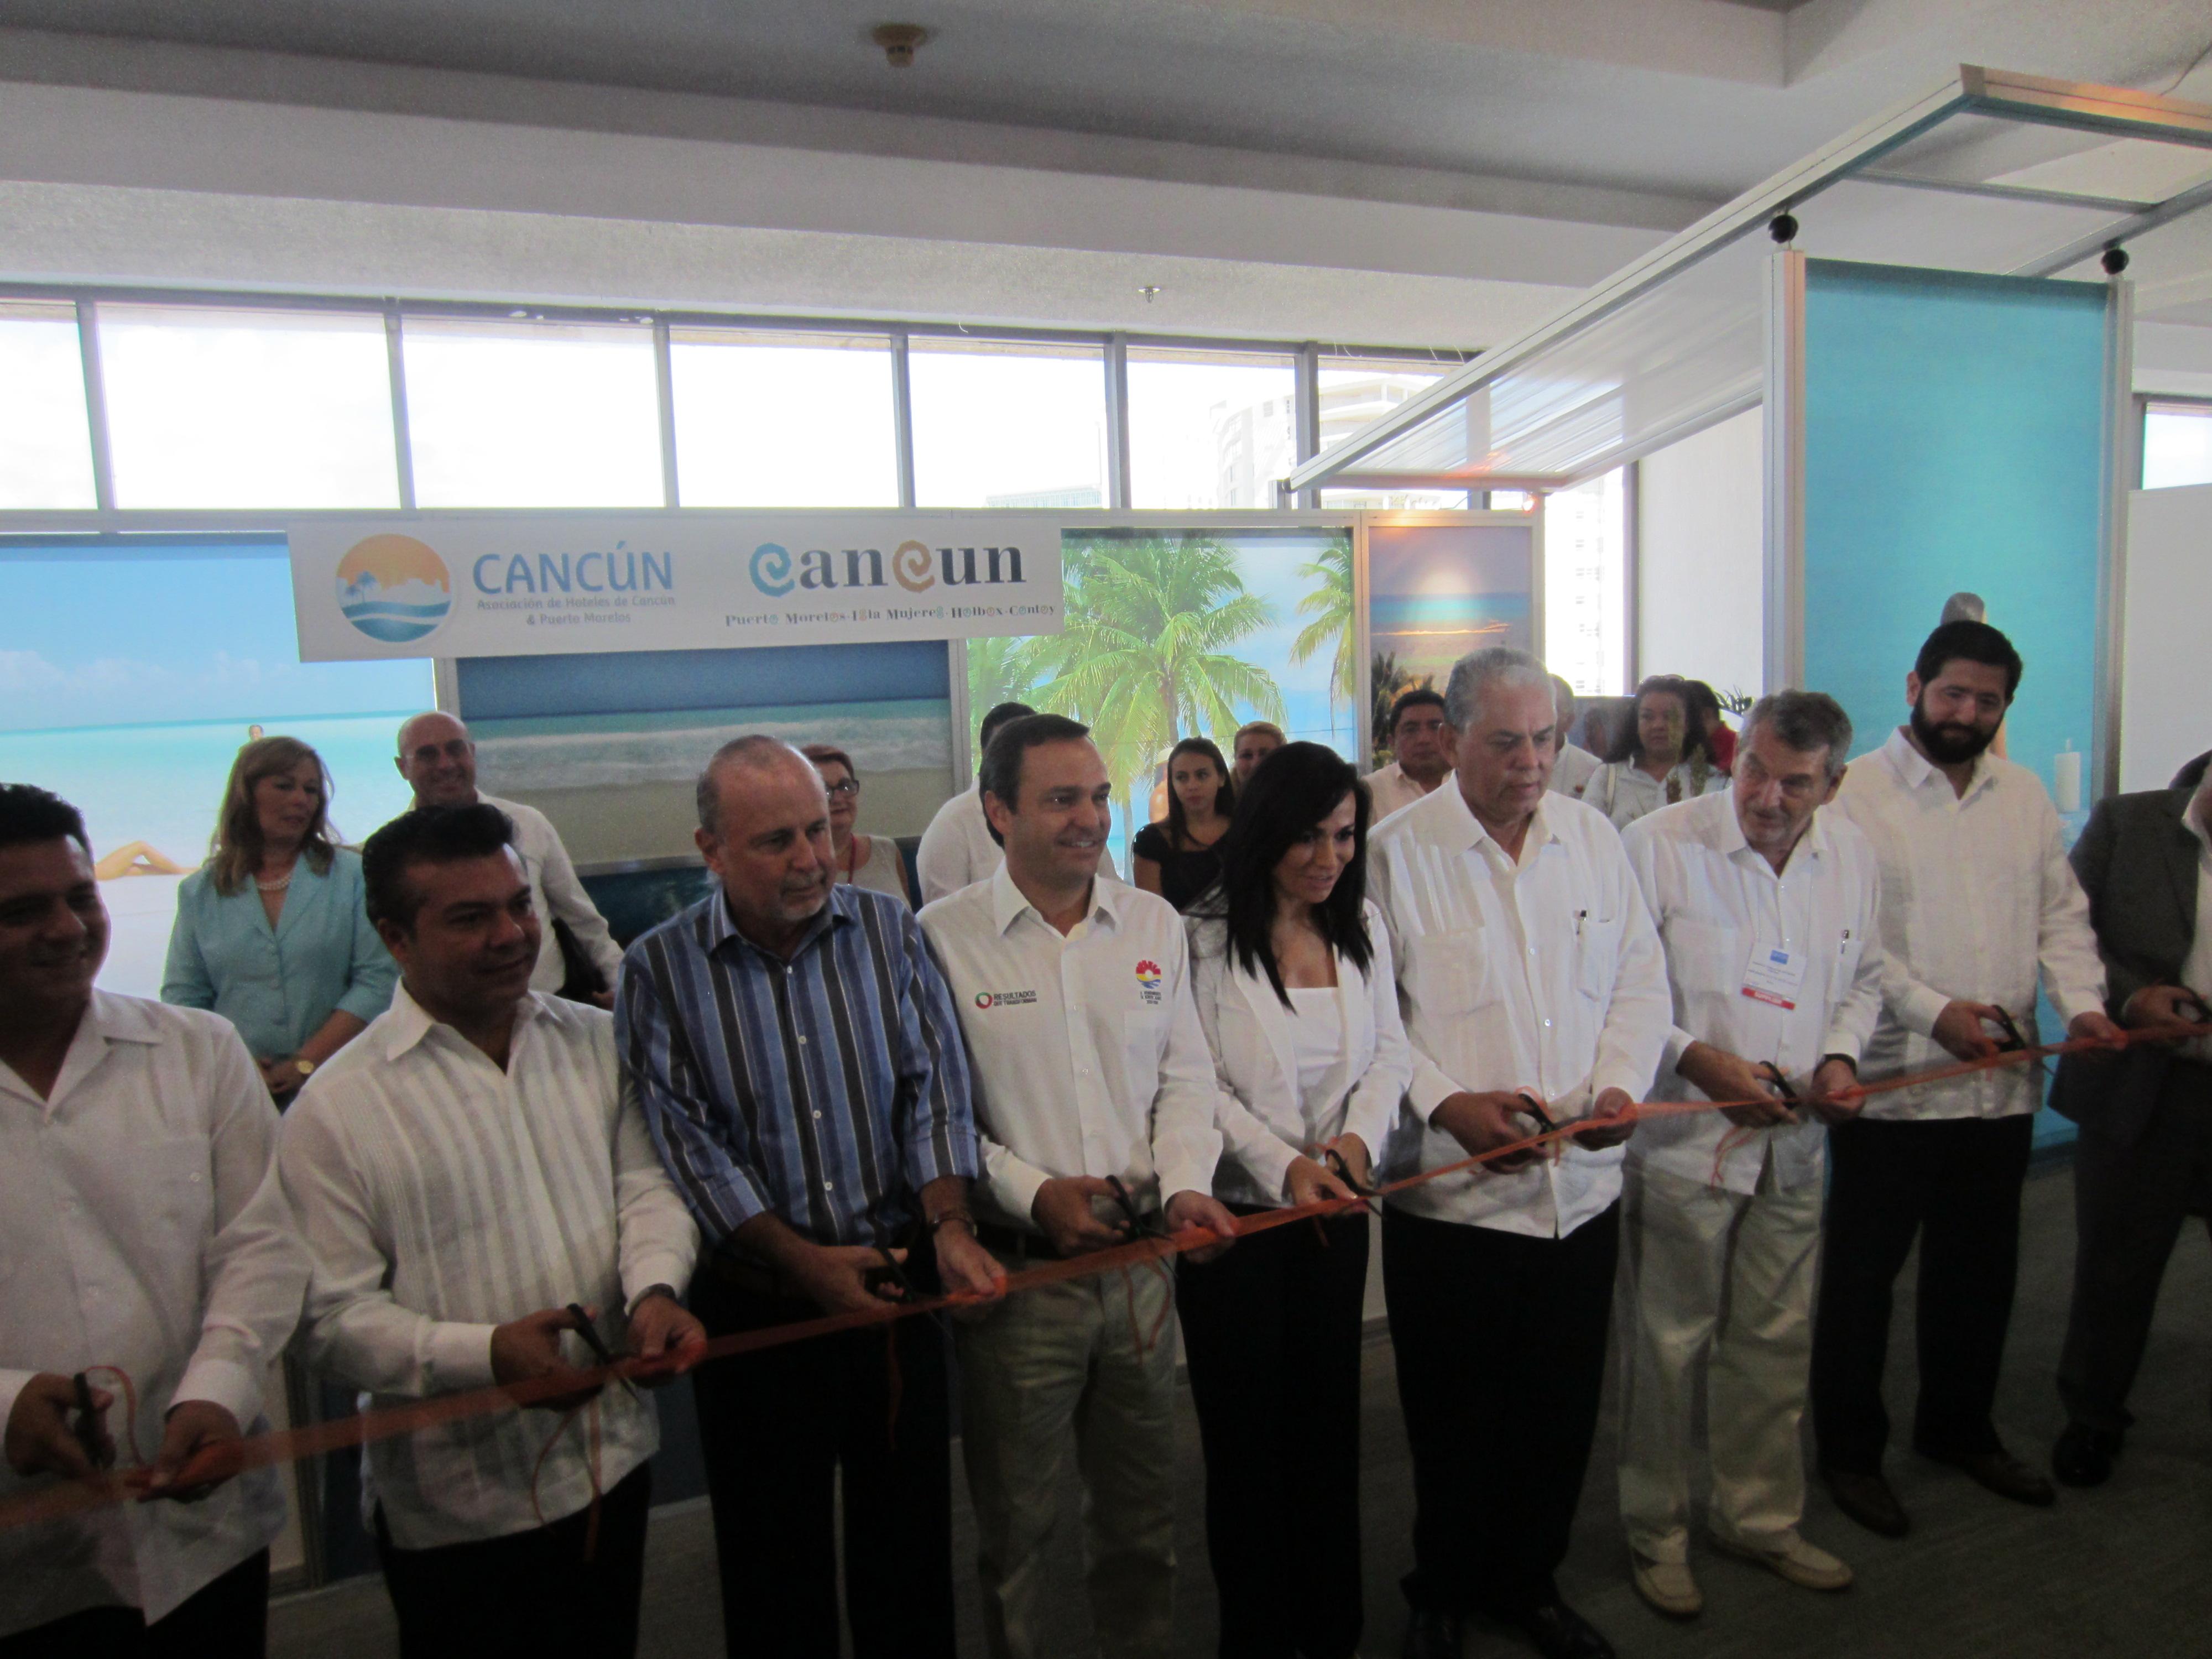 cancun travel martjpg